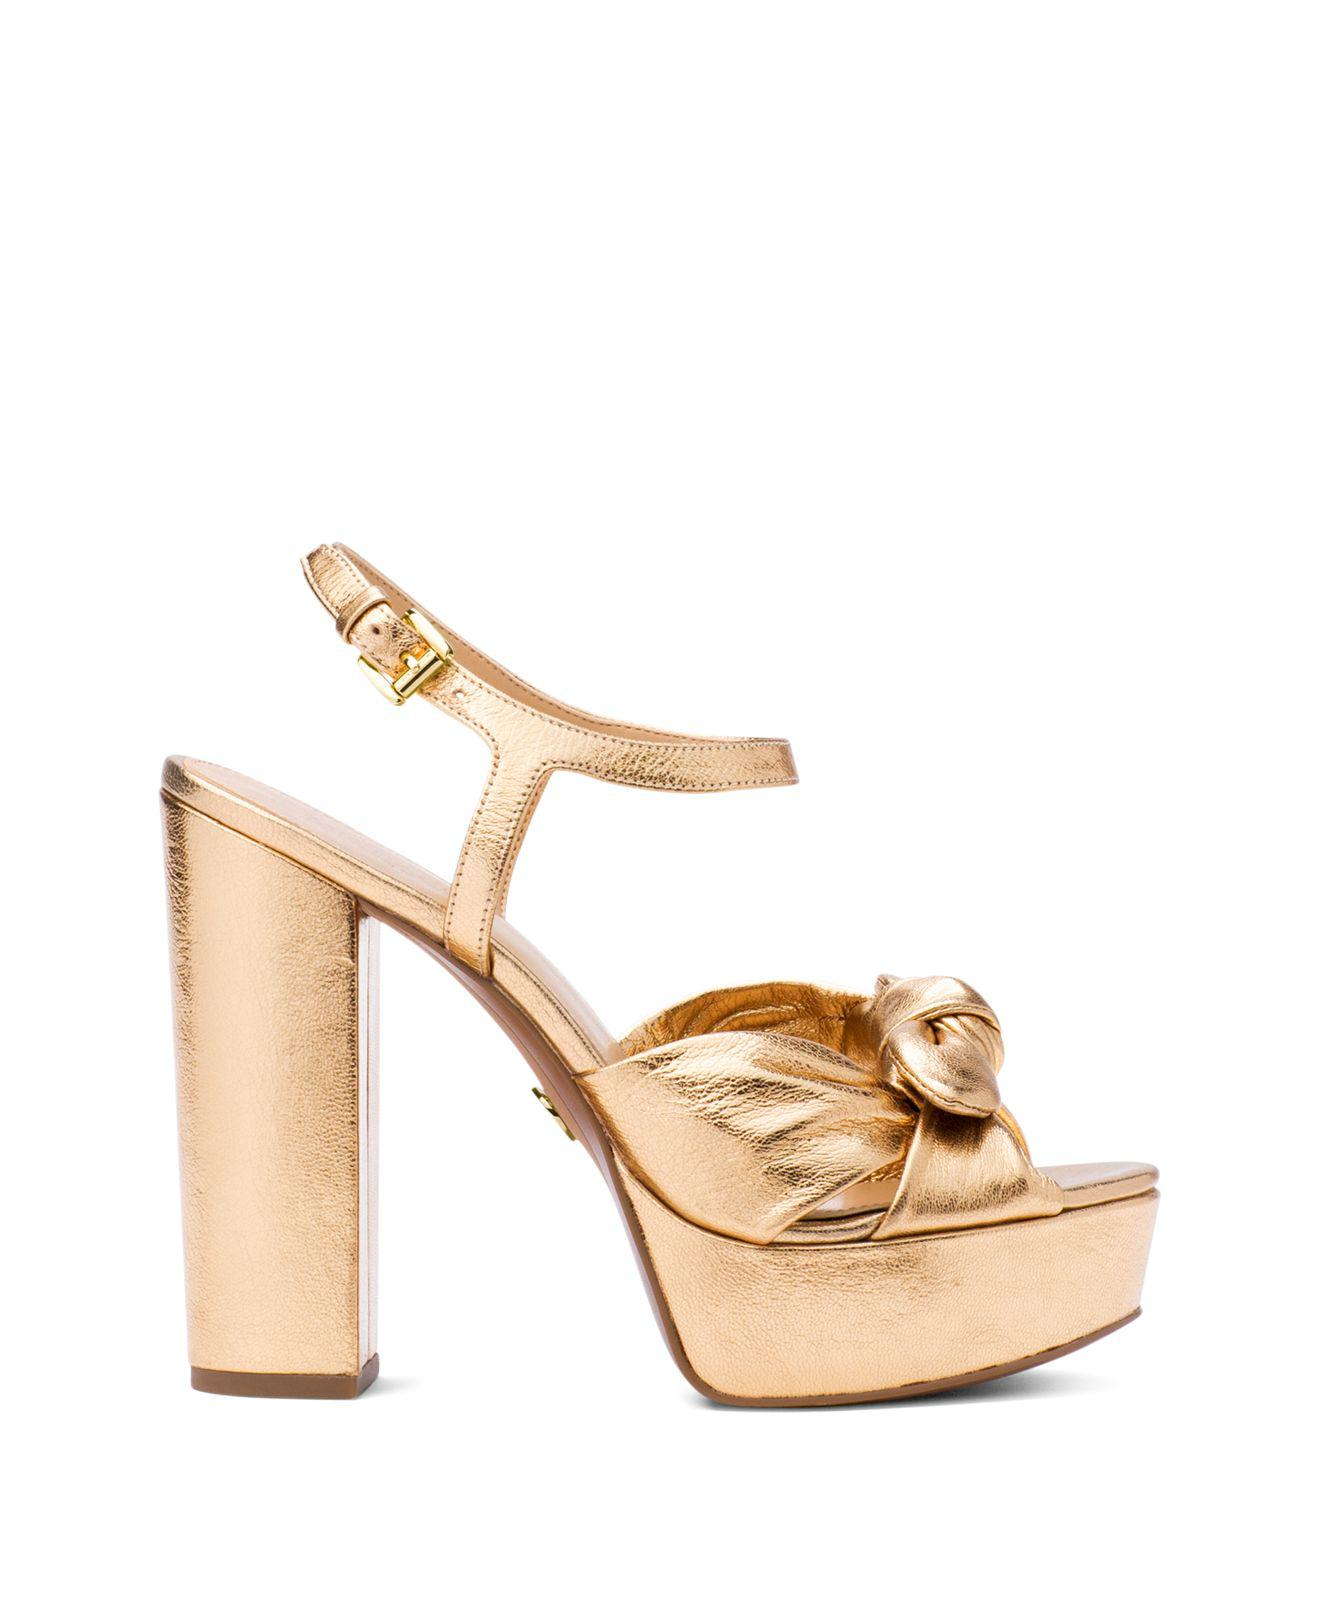 Michael Kors Women's Pippa Leather Platform High-Heel Sandals W53OR